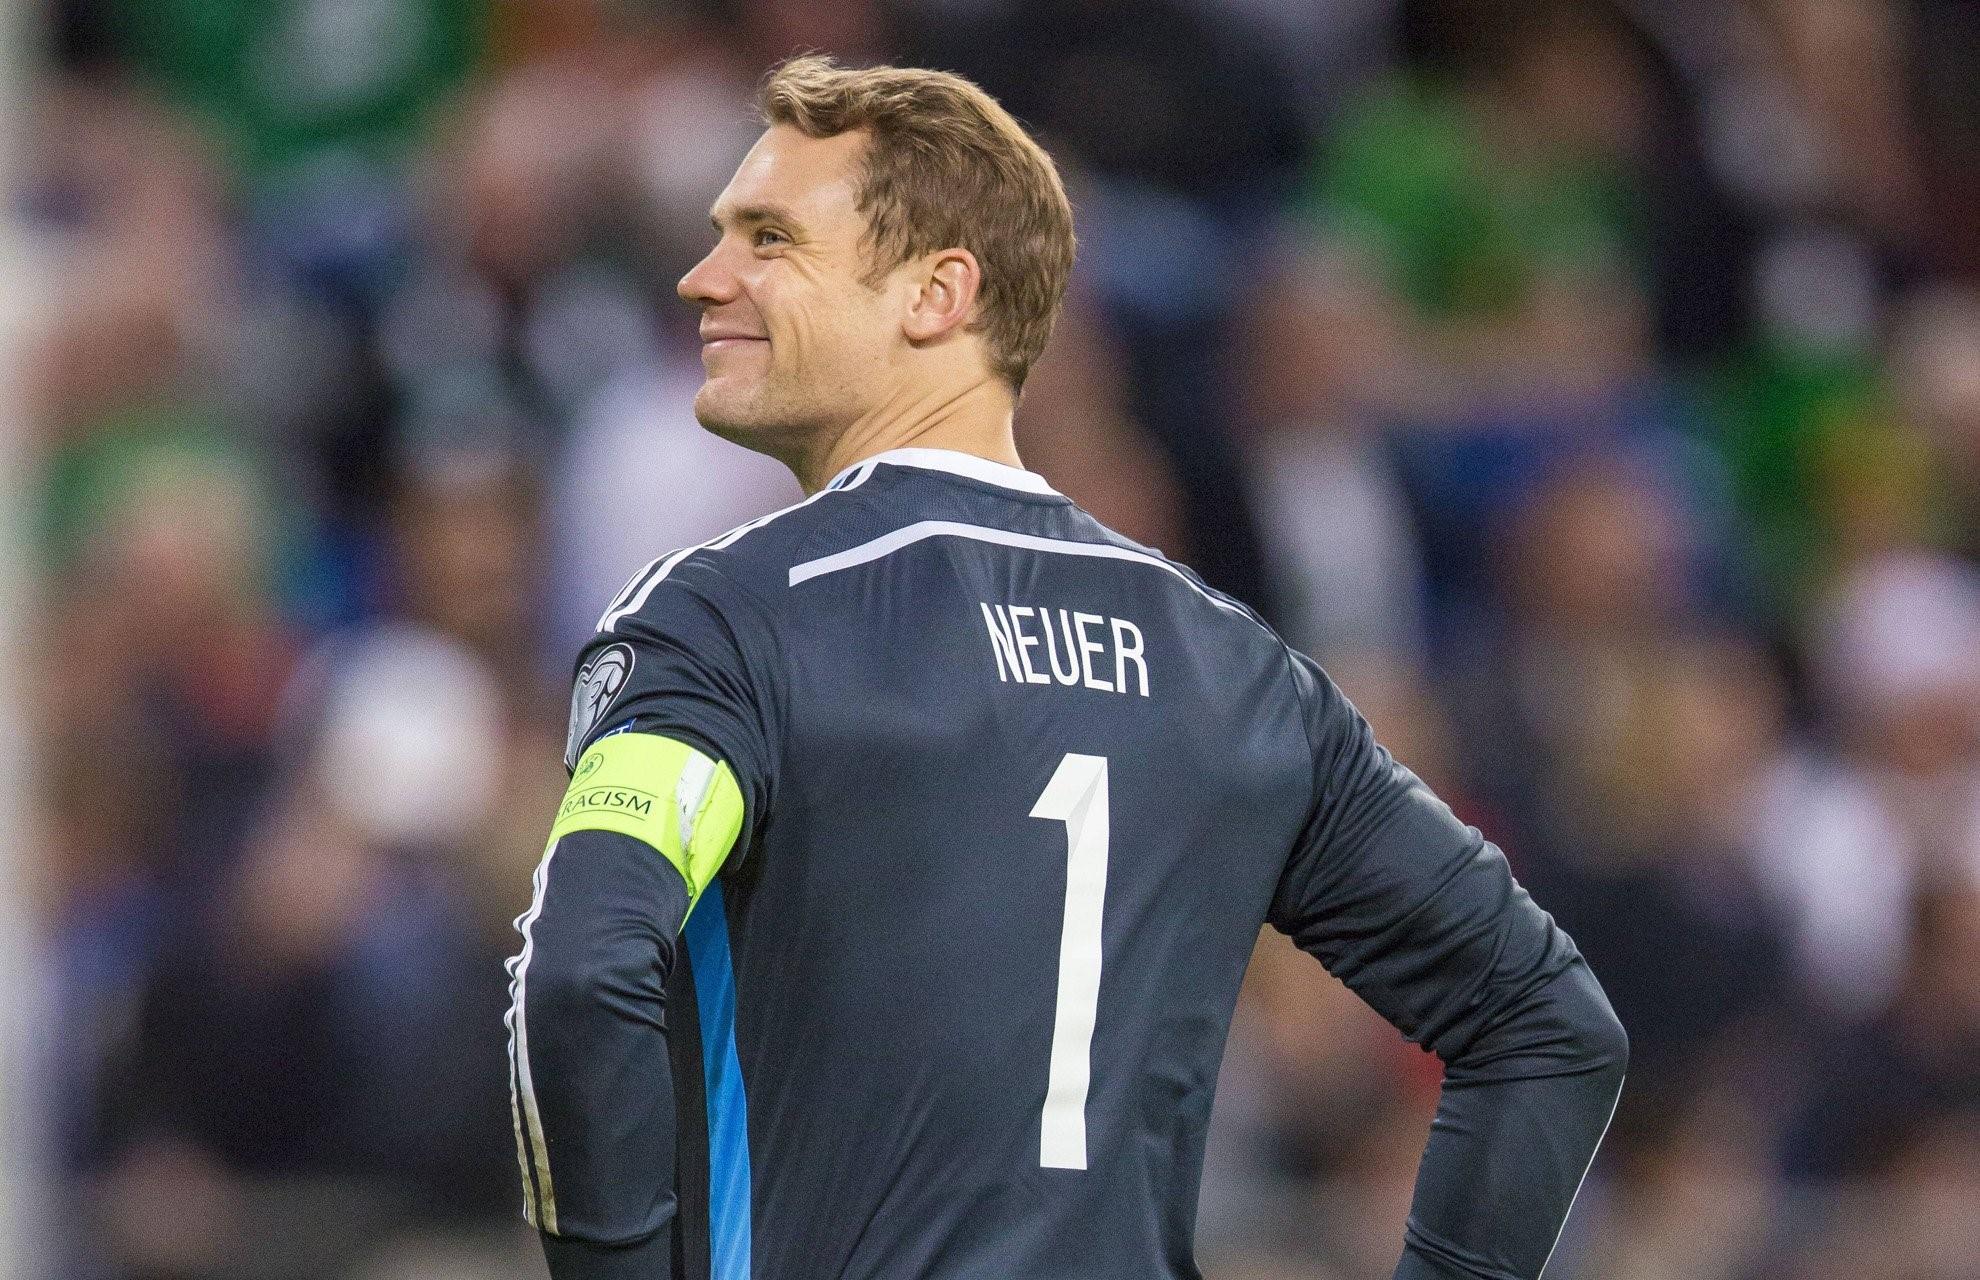 Manuel Neuer 4